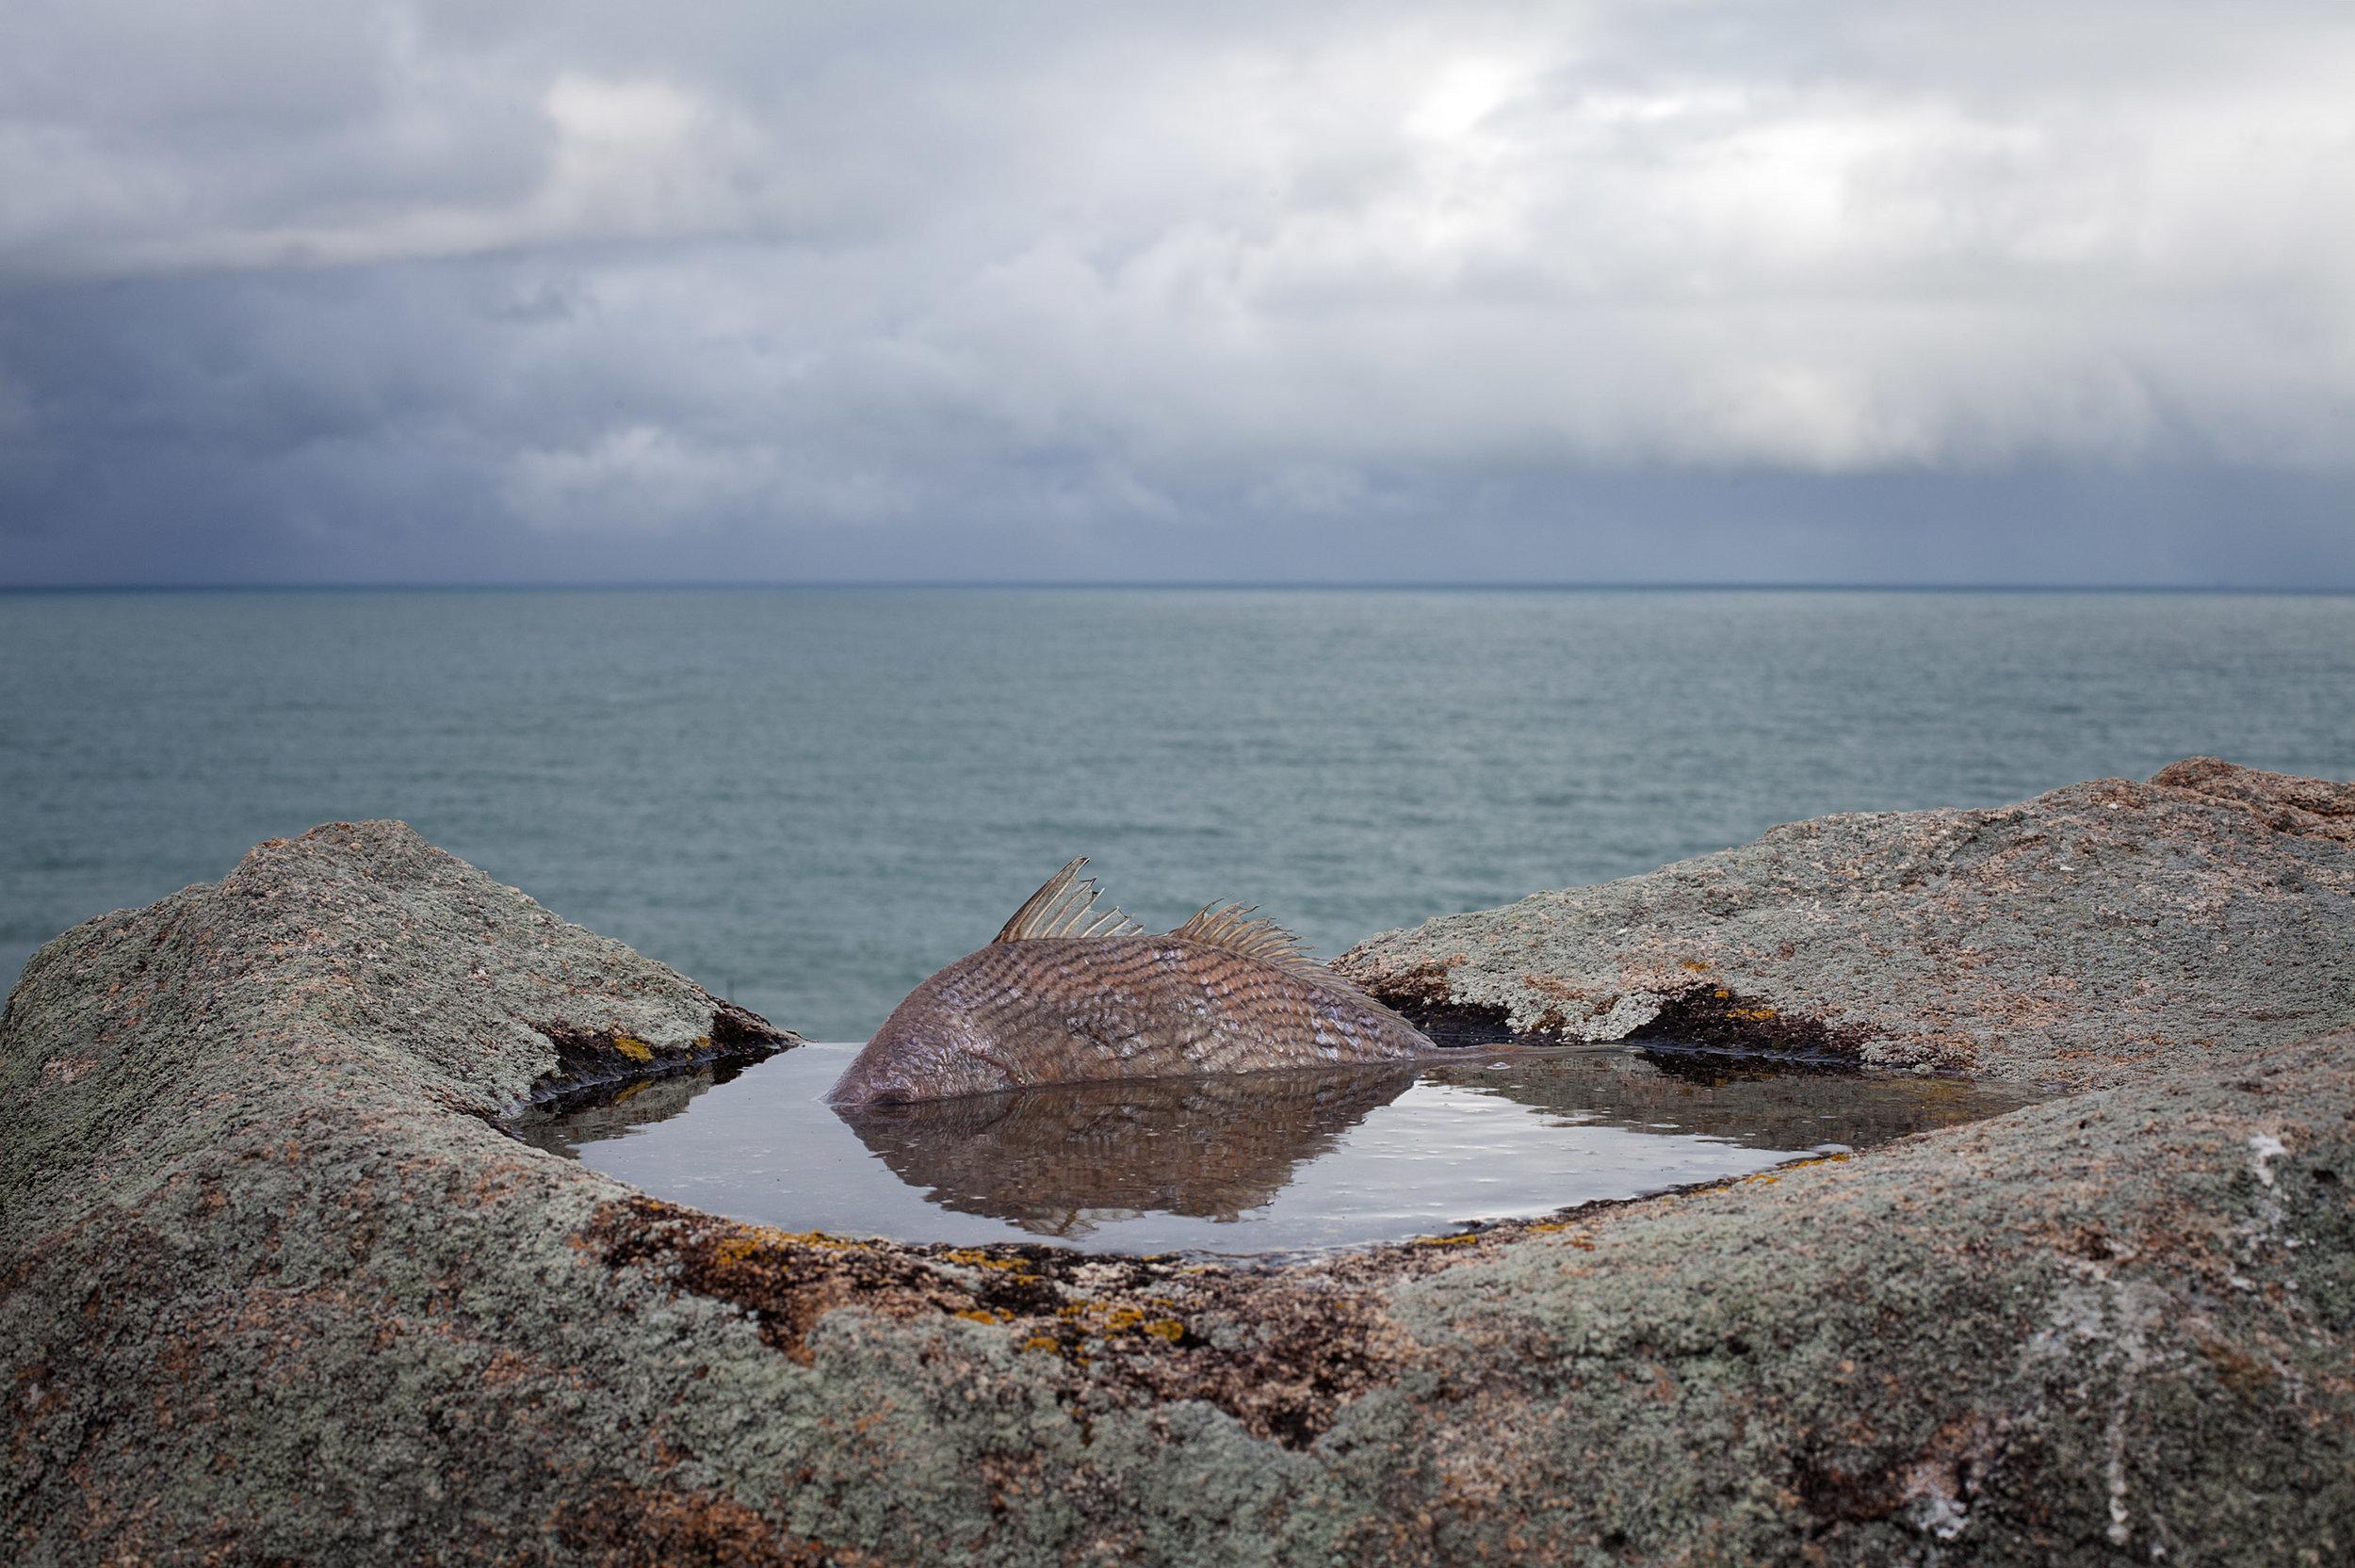 Image : Rodrigo Braga, Sea Island , 2013, photographie 80 x 120 cm.© Rodrigo Braga